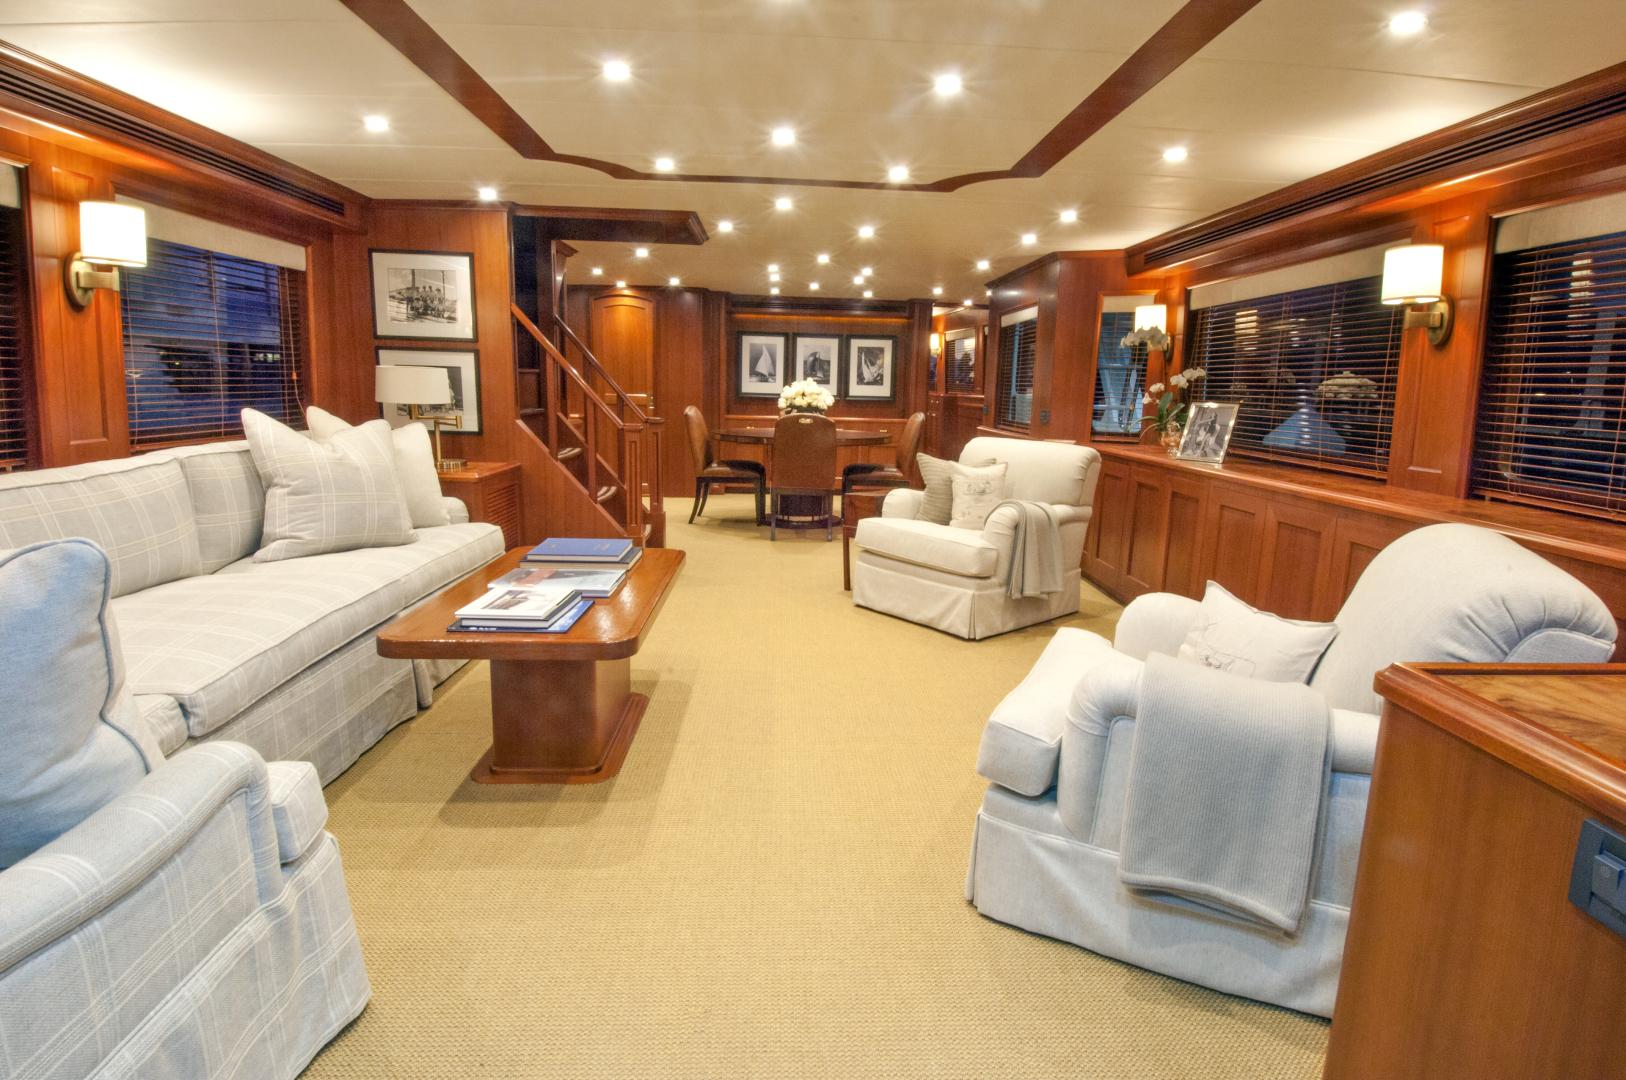 Offshore Yachts-Motoryacht 2020 -United States-1117786   Thumbnail